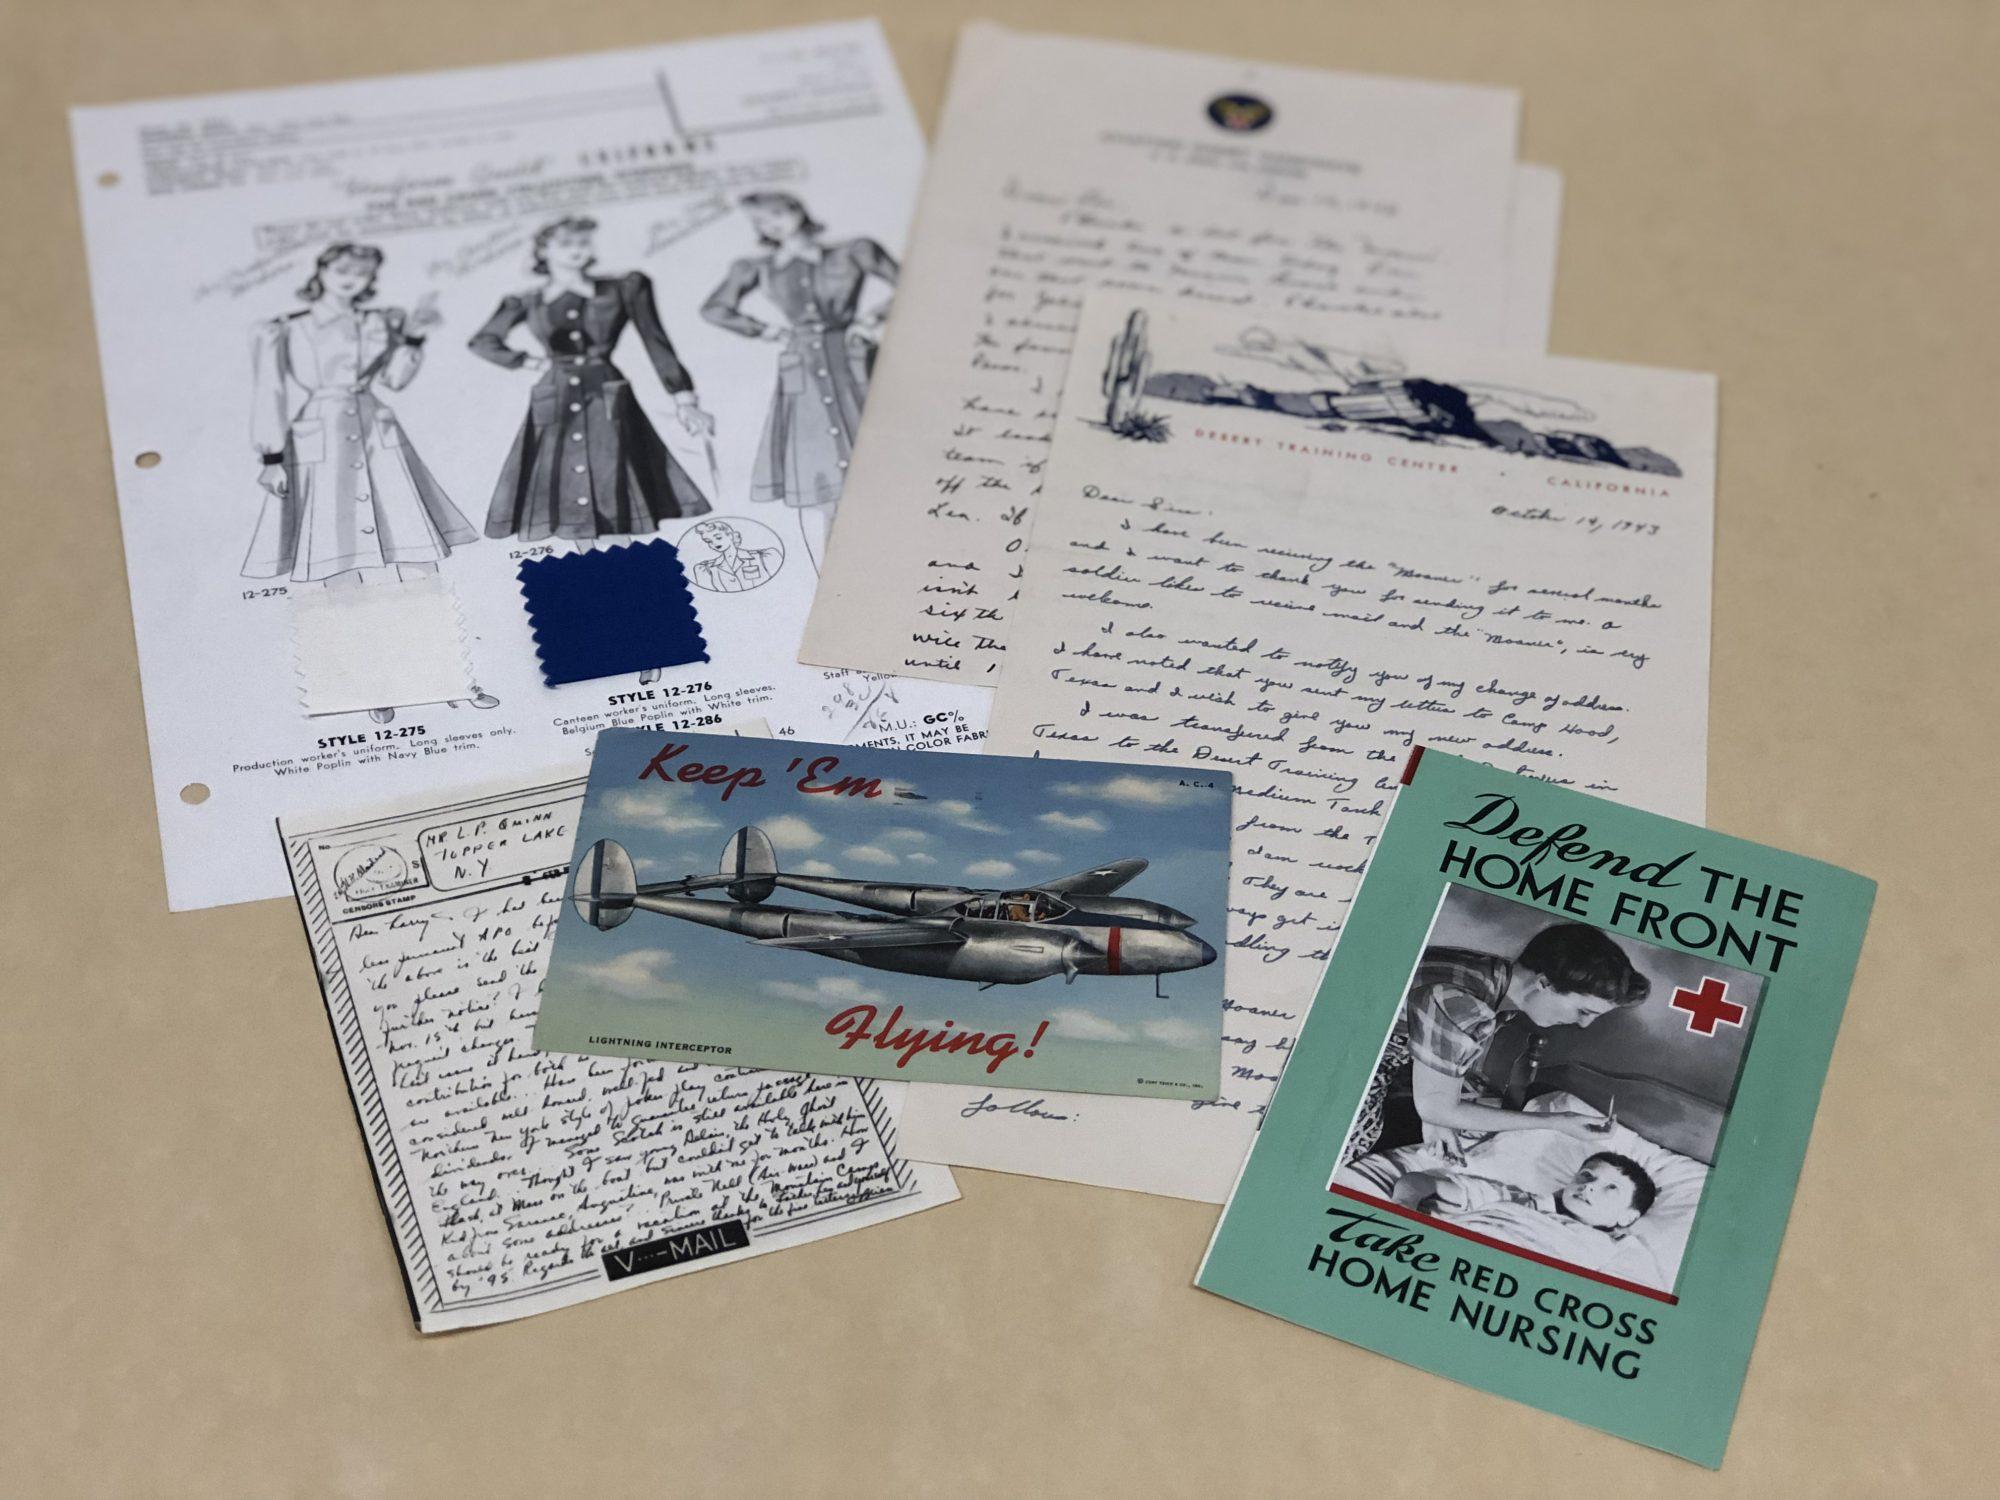 From Wilderness to Warfront: The Adirondacks and World War II